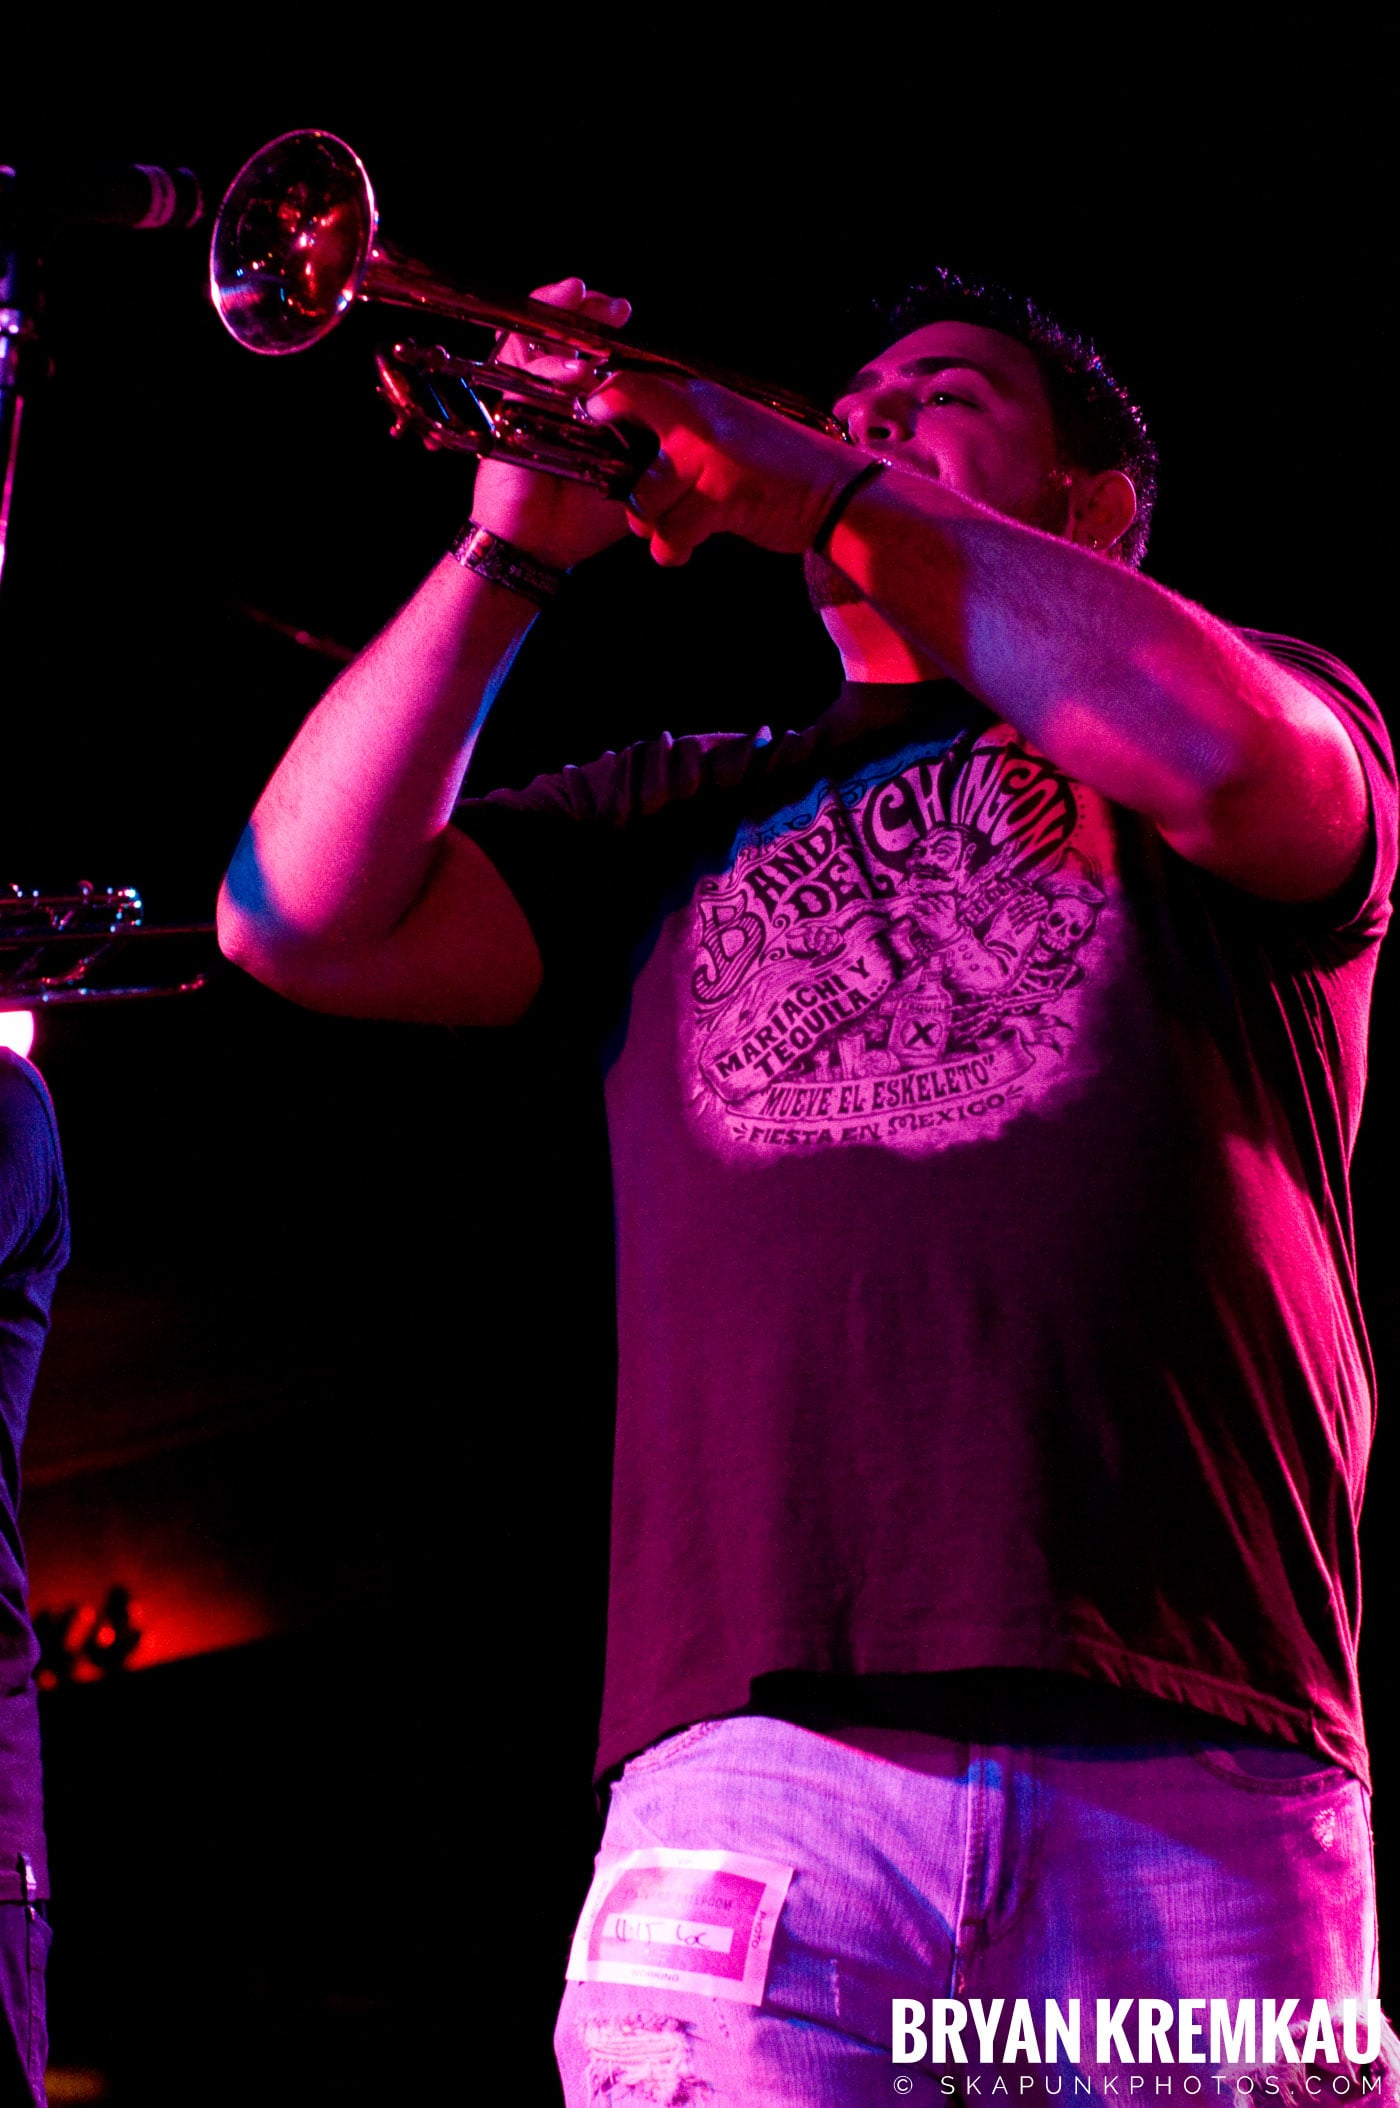 Avon Junkies (Ska is Dead Tour) @ Starland Ballroom, Sayreville, NJ - 11.15.09 (2)